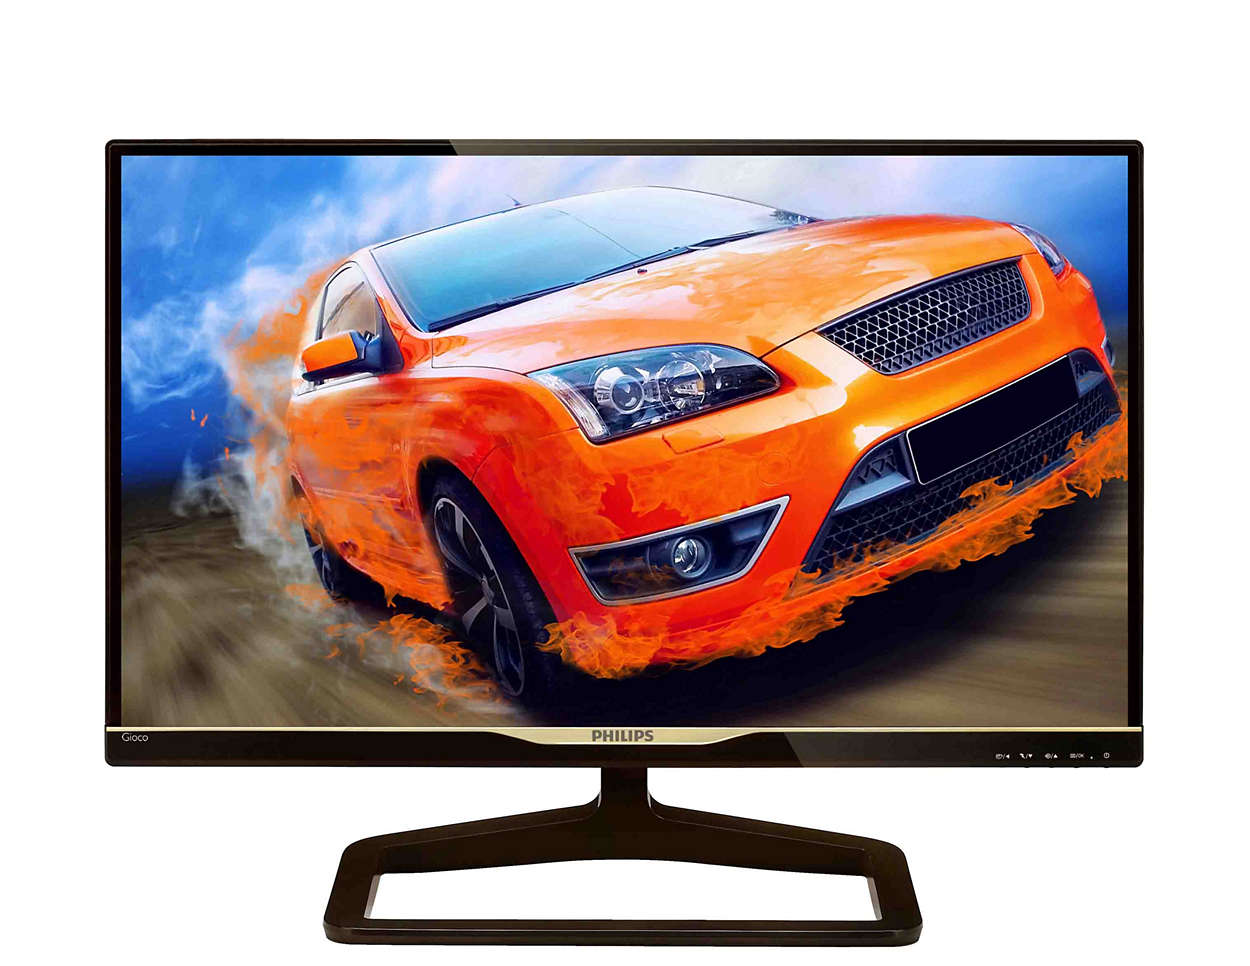 Elegancki monitor o dużych możliwościach